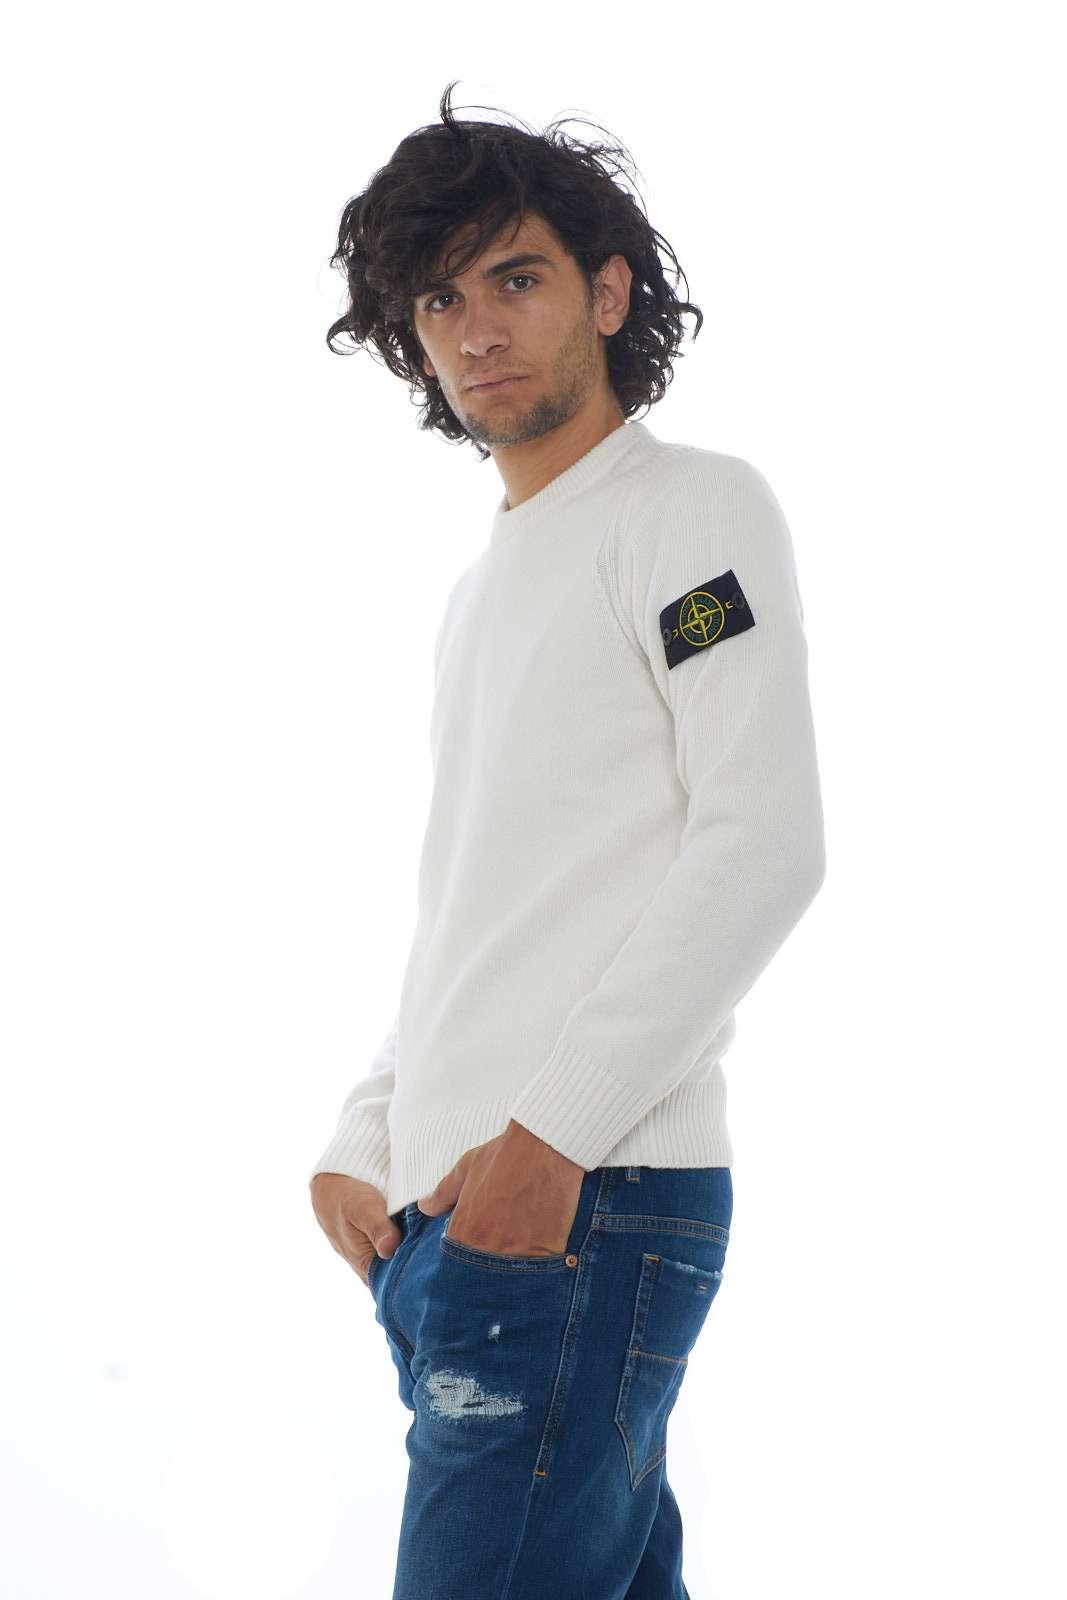 https://www.parmax.com/media/catalog/product/a/i/AI-outlet_parmax-maglia-uomo-Stone-Island-7115552A3-B.jpg